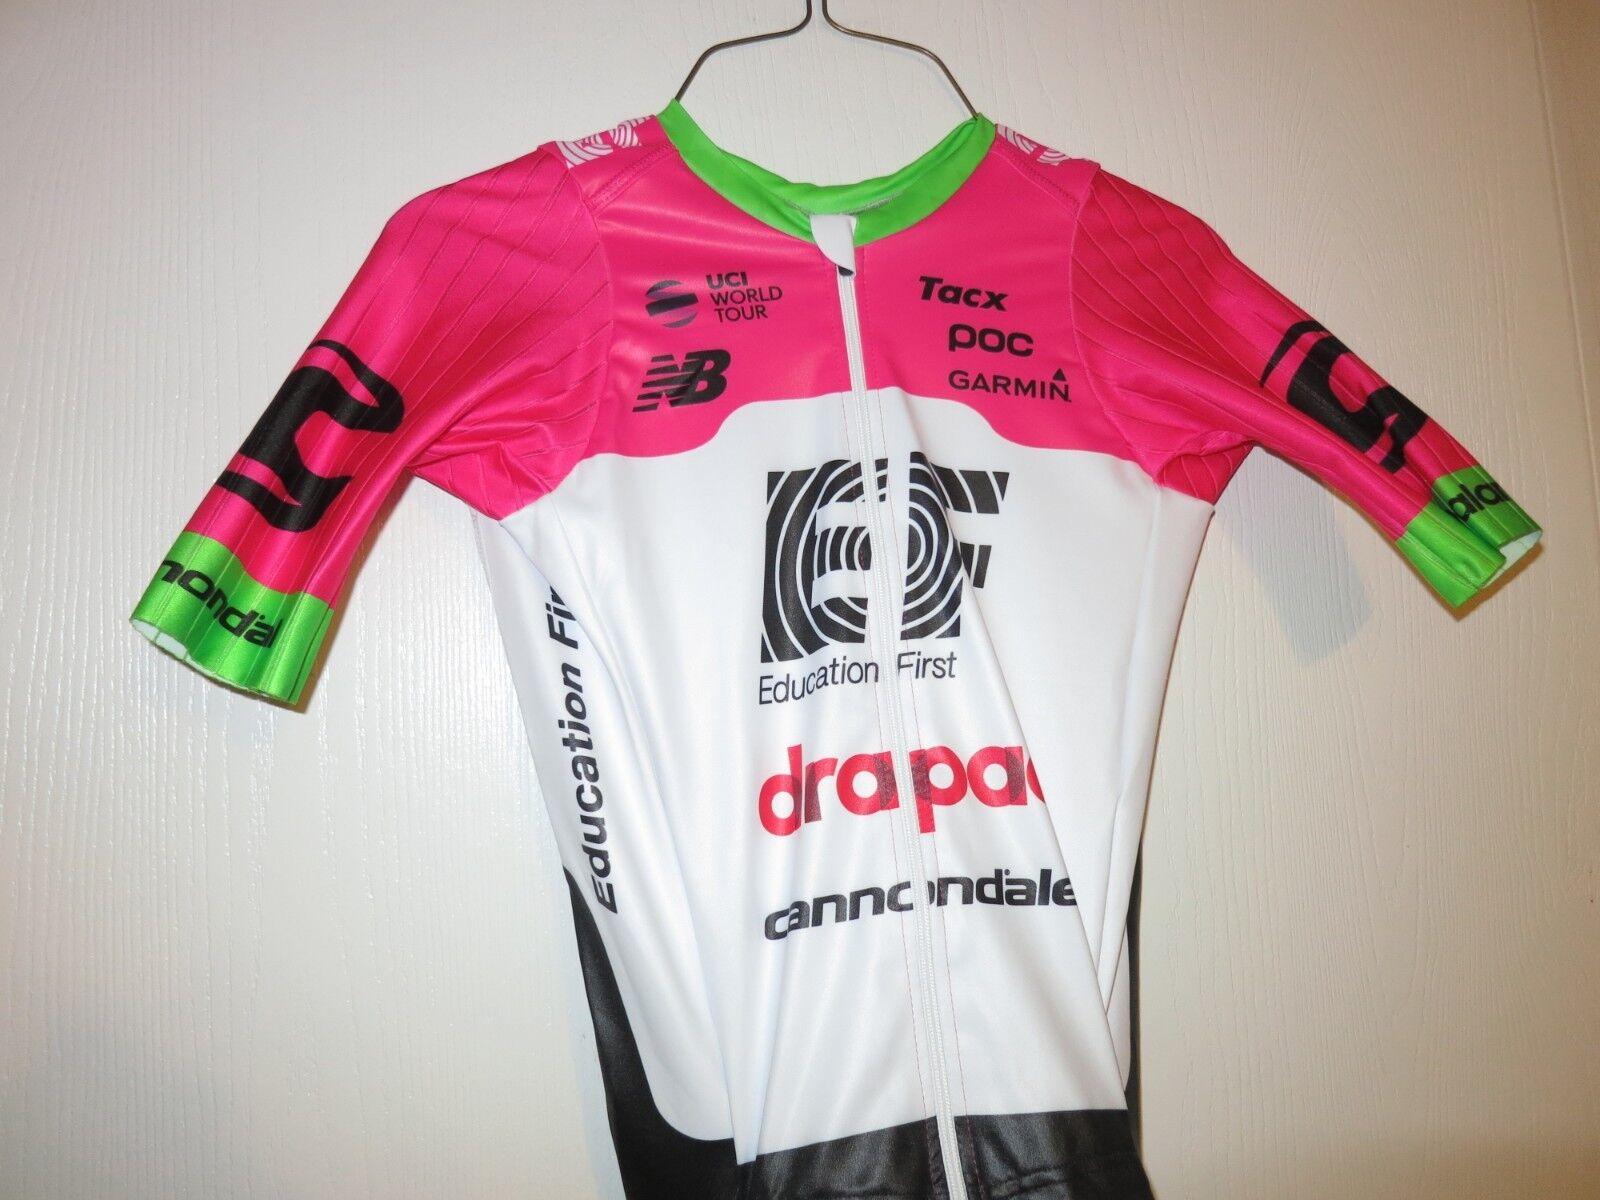 2018 POC POC 2018 EF Drapac Cannondale Pro Cycling Team AeroSuit Race Jersey Bib Short XS 319a07